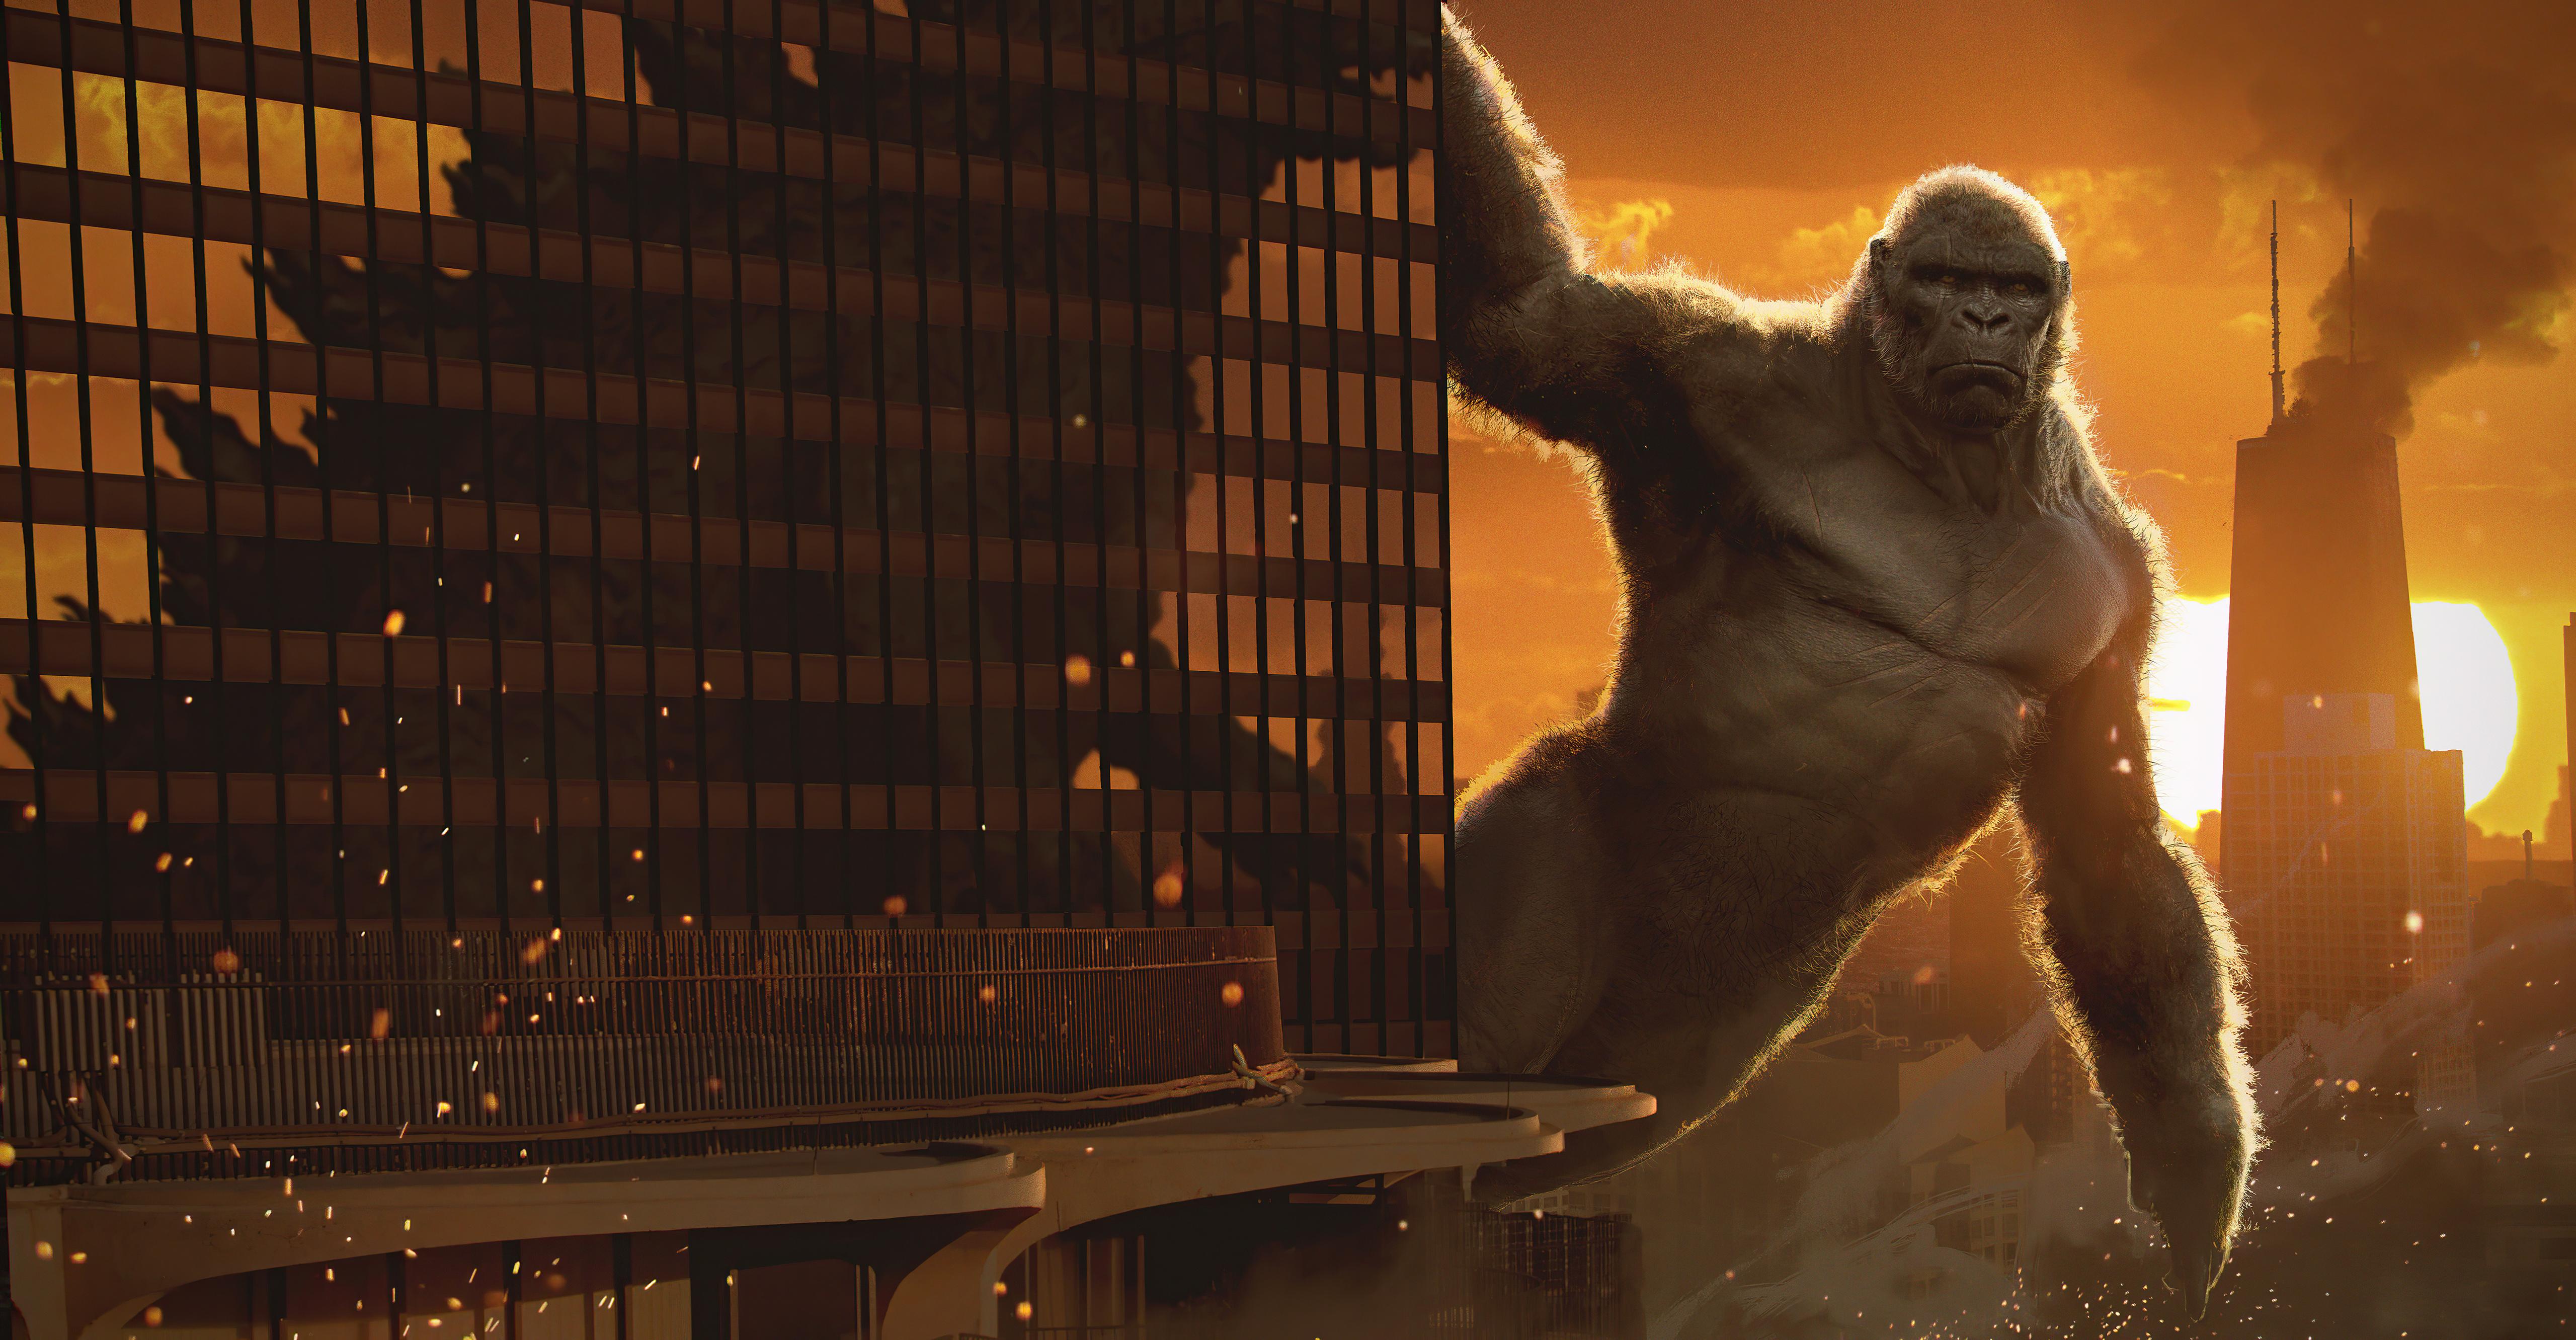 Fondos de pantalla Kong v Godzilla